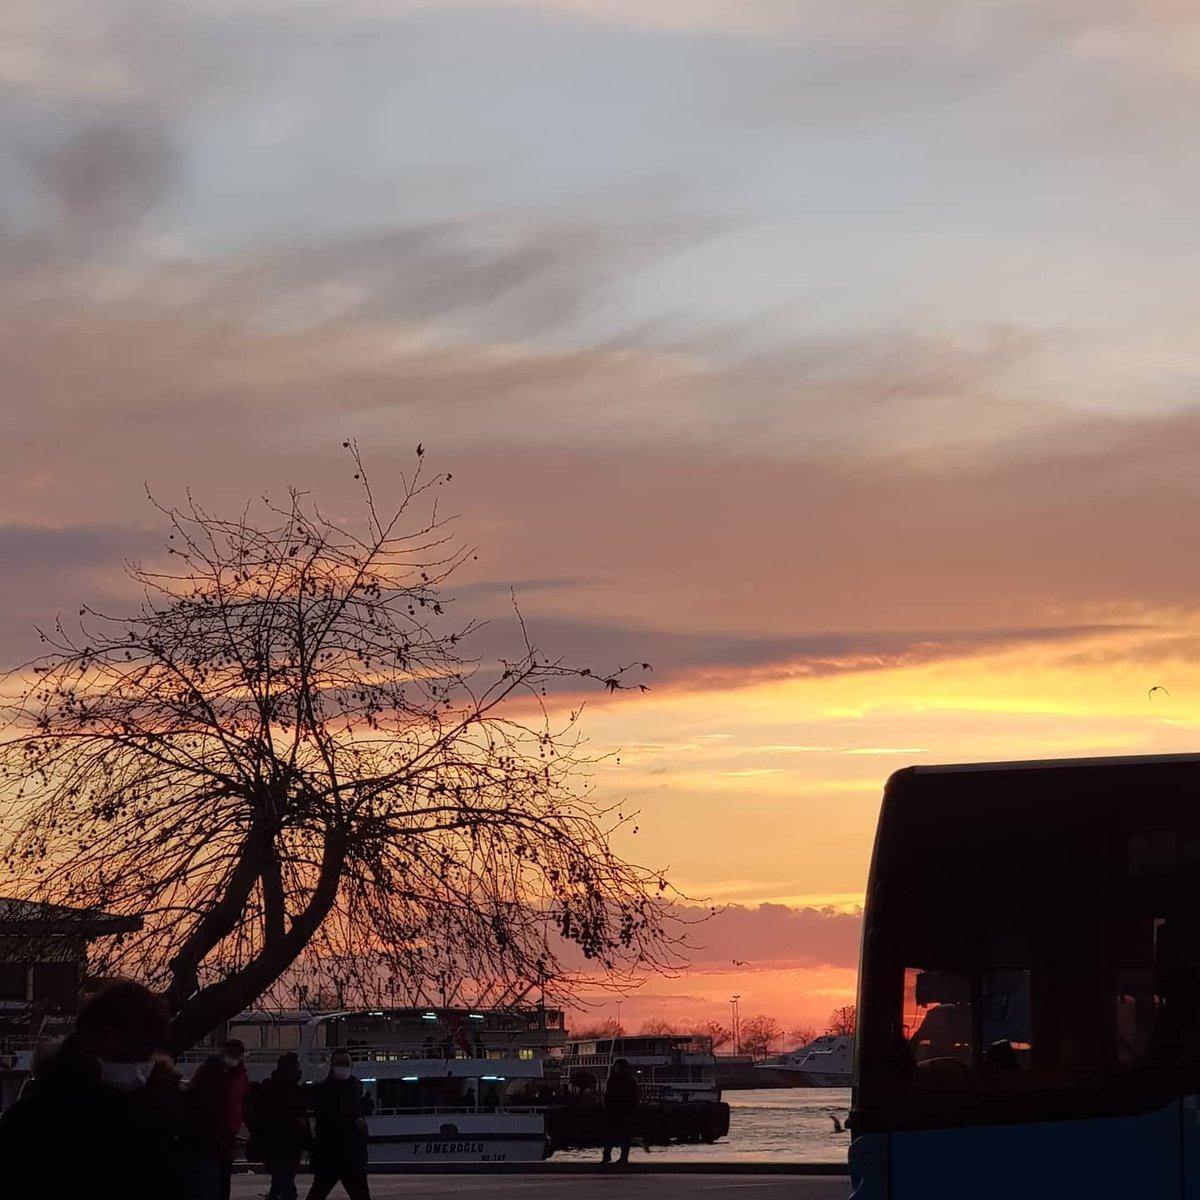 #Günbatımı #sunset #sonnenuntergang #roava #Istanbul #Kadıköy #nofilter 21 Ocak 2021